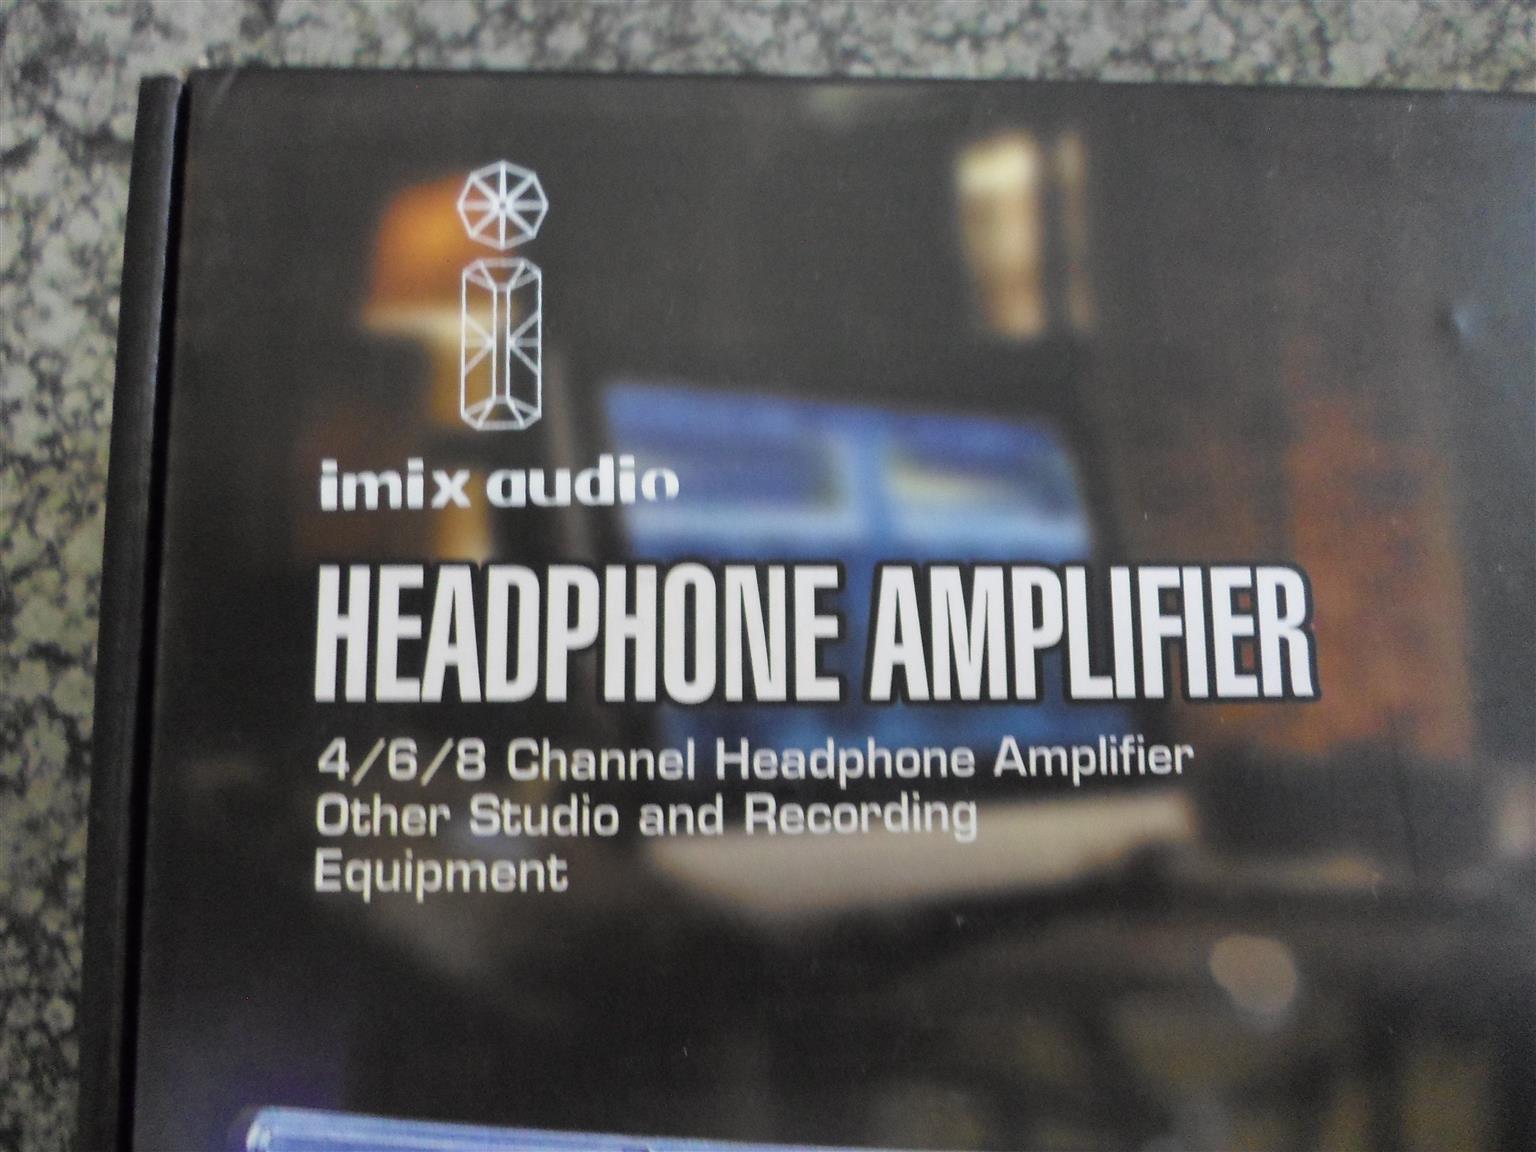 Imix Audio Headphone Amplifier